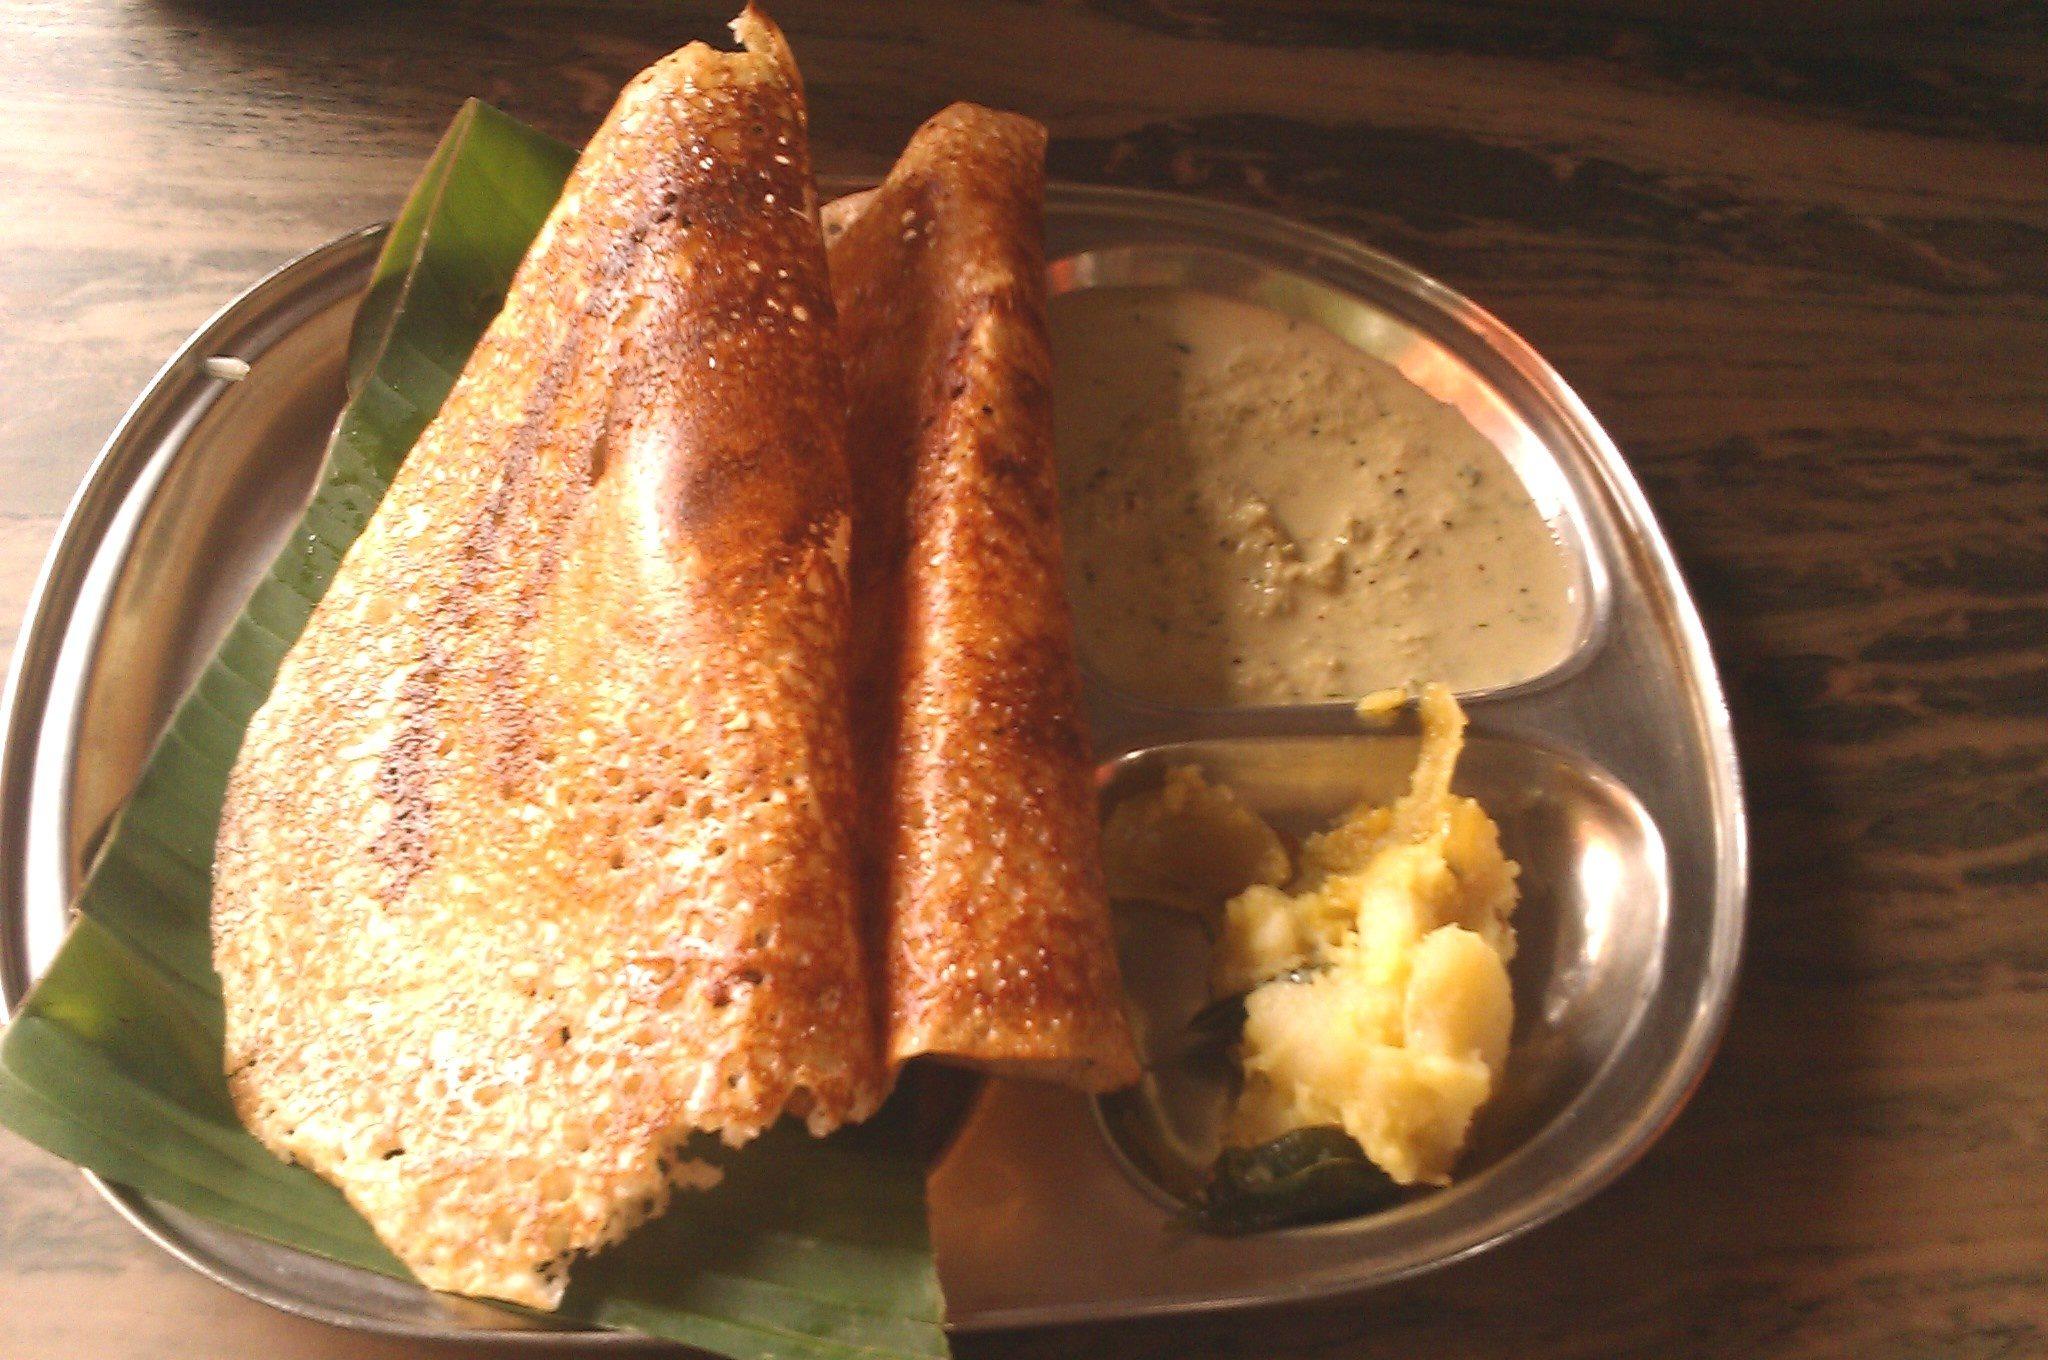 Kunda sweet in bangalore dating